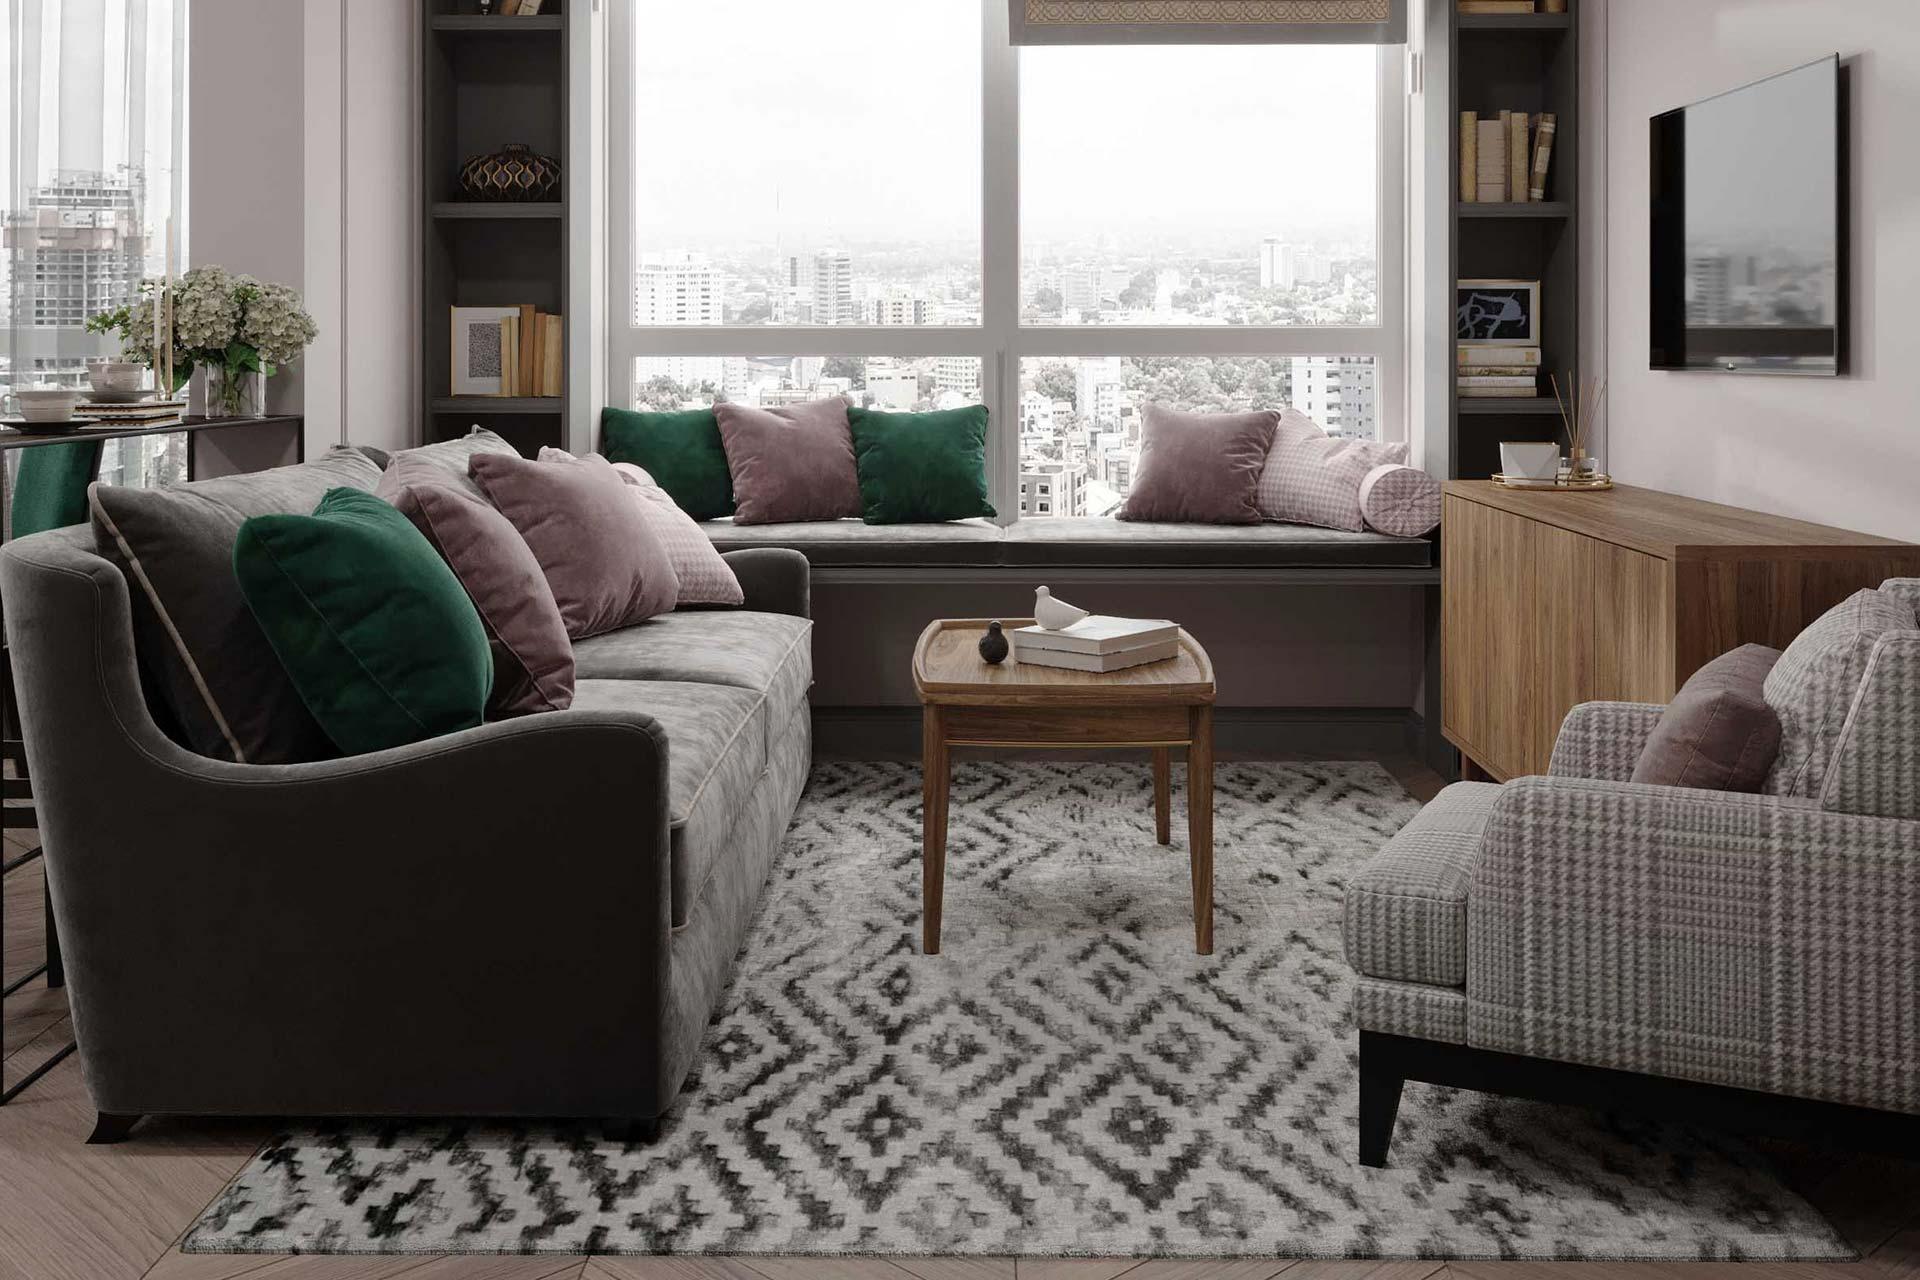 Дизайн интерьера квартиры-студии в ЖК Сити Парк